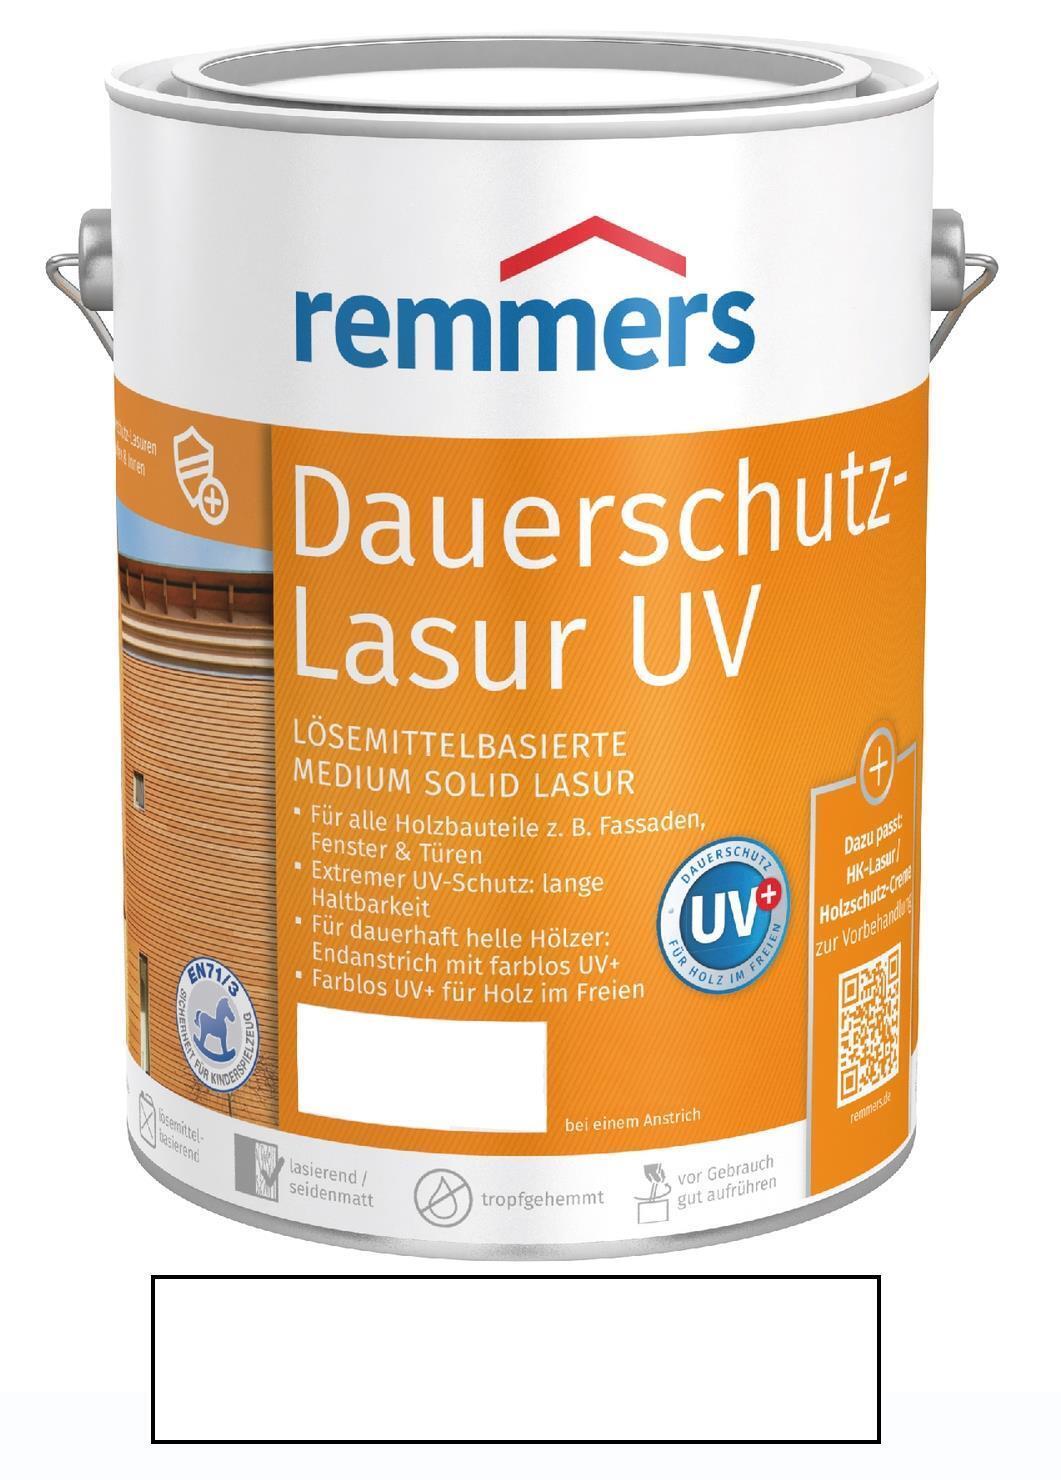 Remmers Langzeit-Lasur UV Weiß 5 l NEUWARE